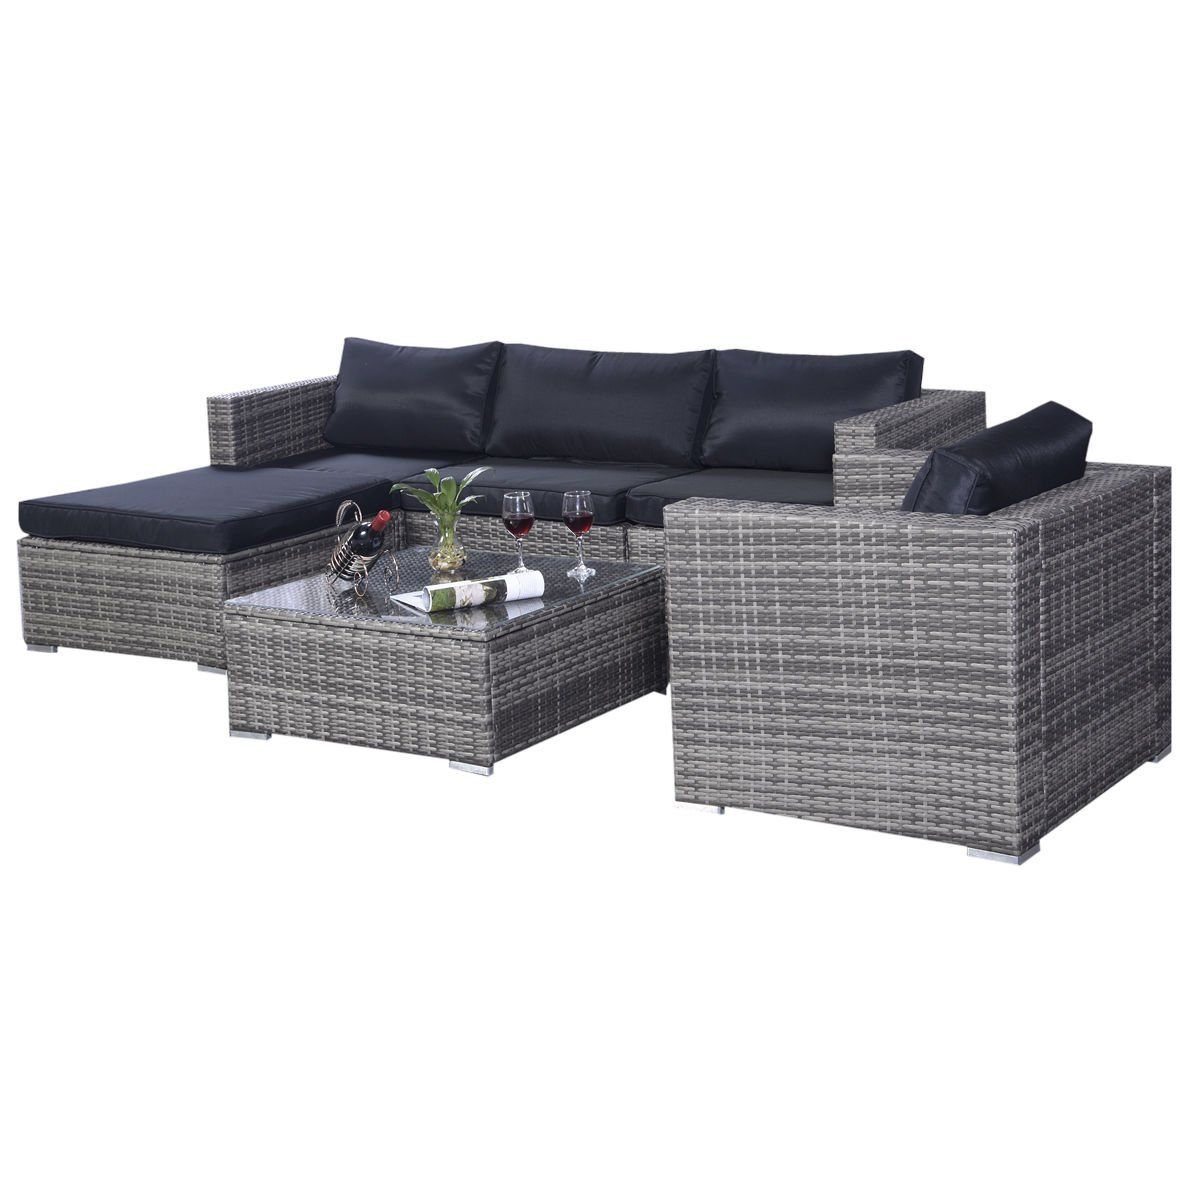 Recliner Sofa Set Amazon Black Chair Tangkula 6 Pcs Outdoor Wicker Furniture